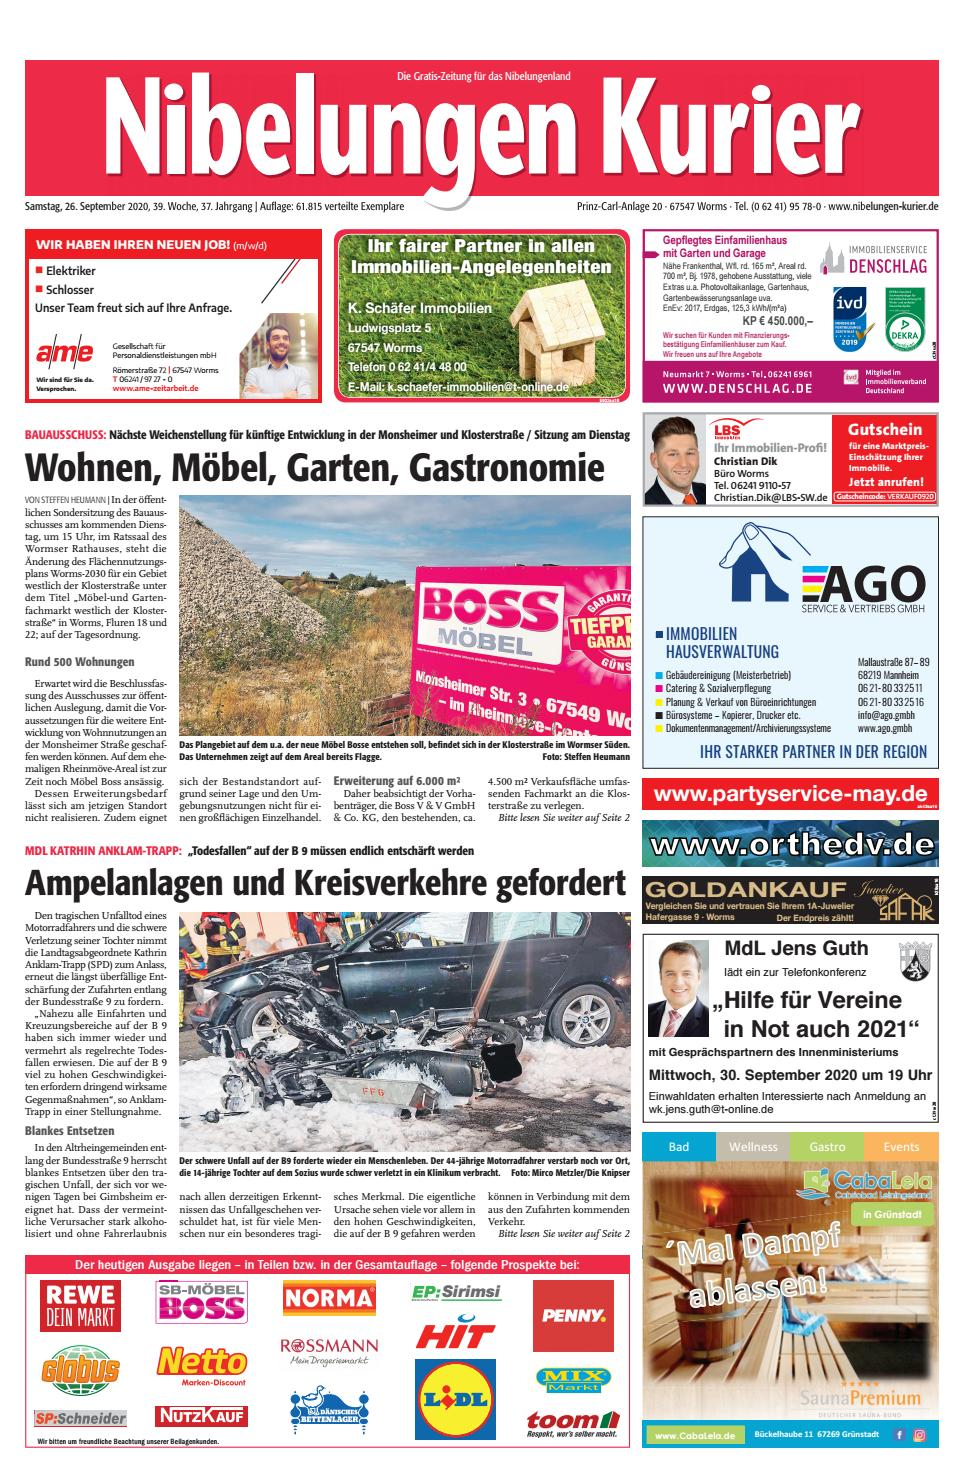 Samstag 26 September 2020 39 Woche By Nibelungen Kurier Issuu